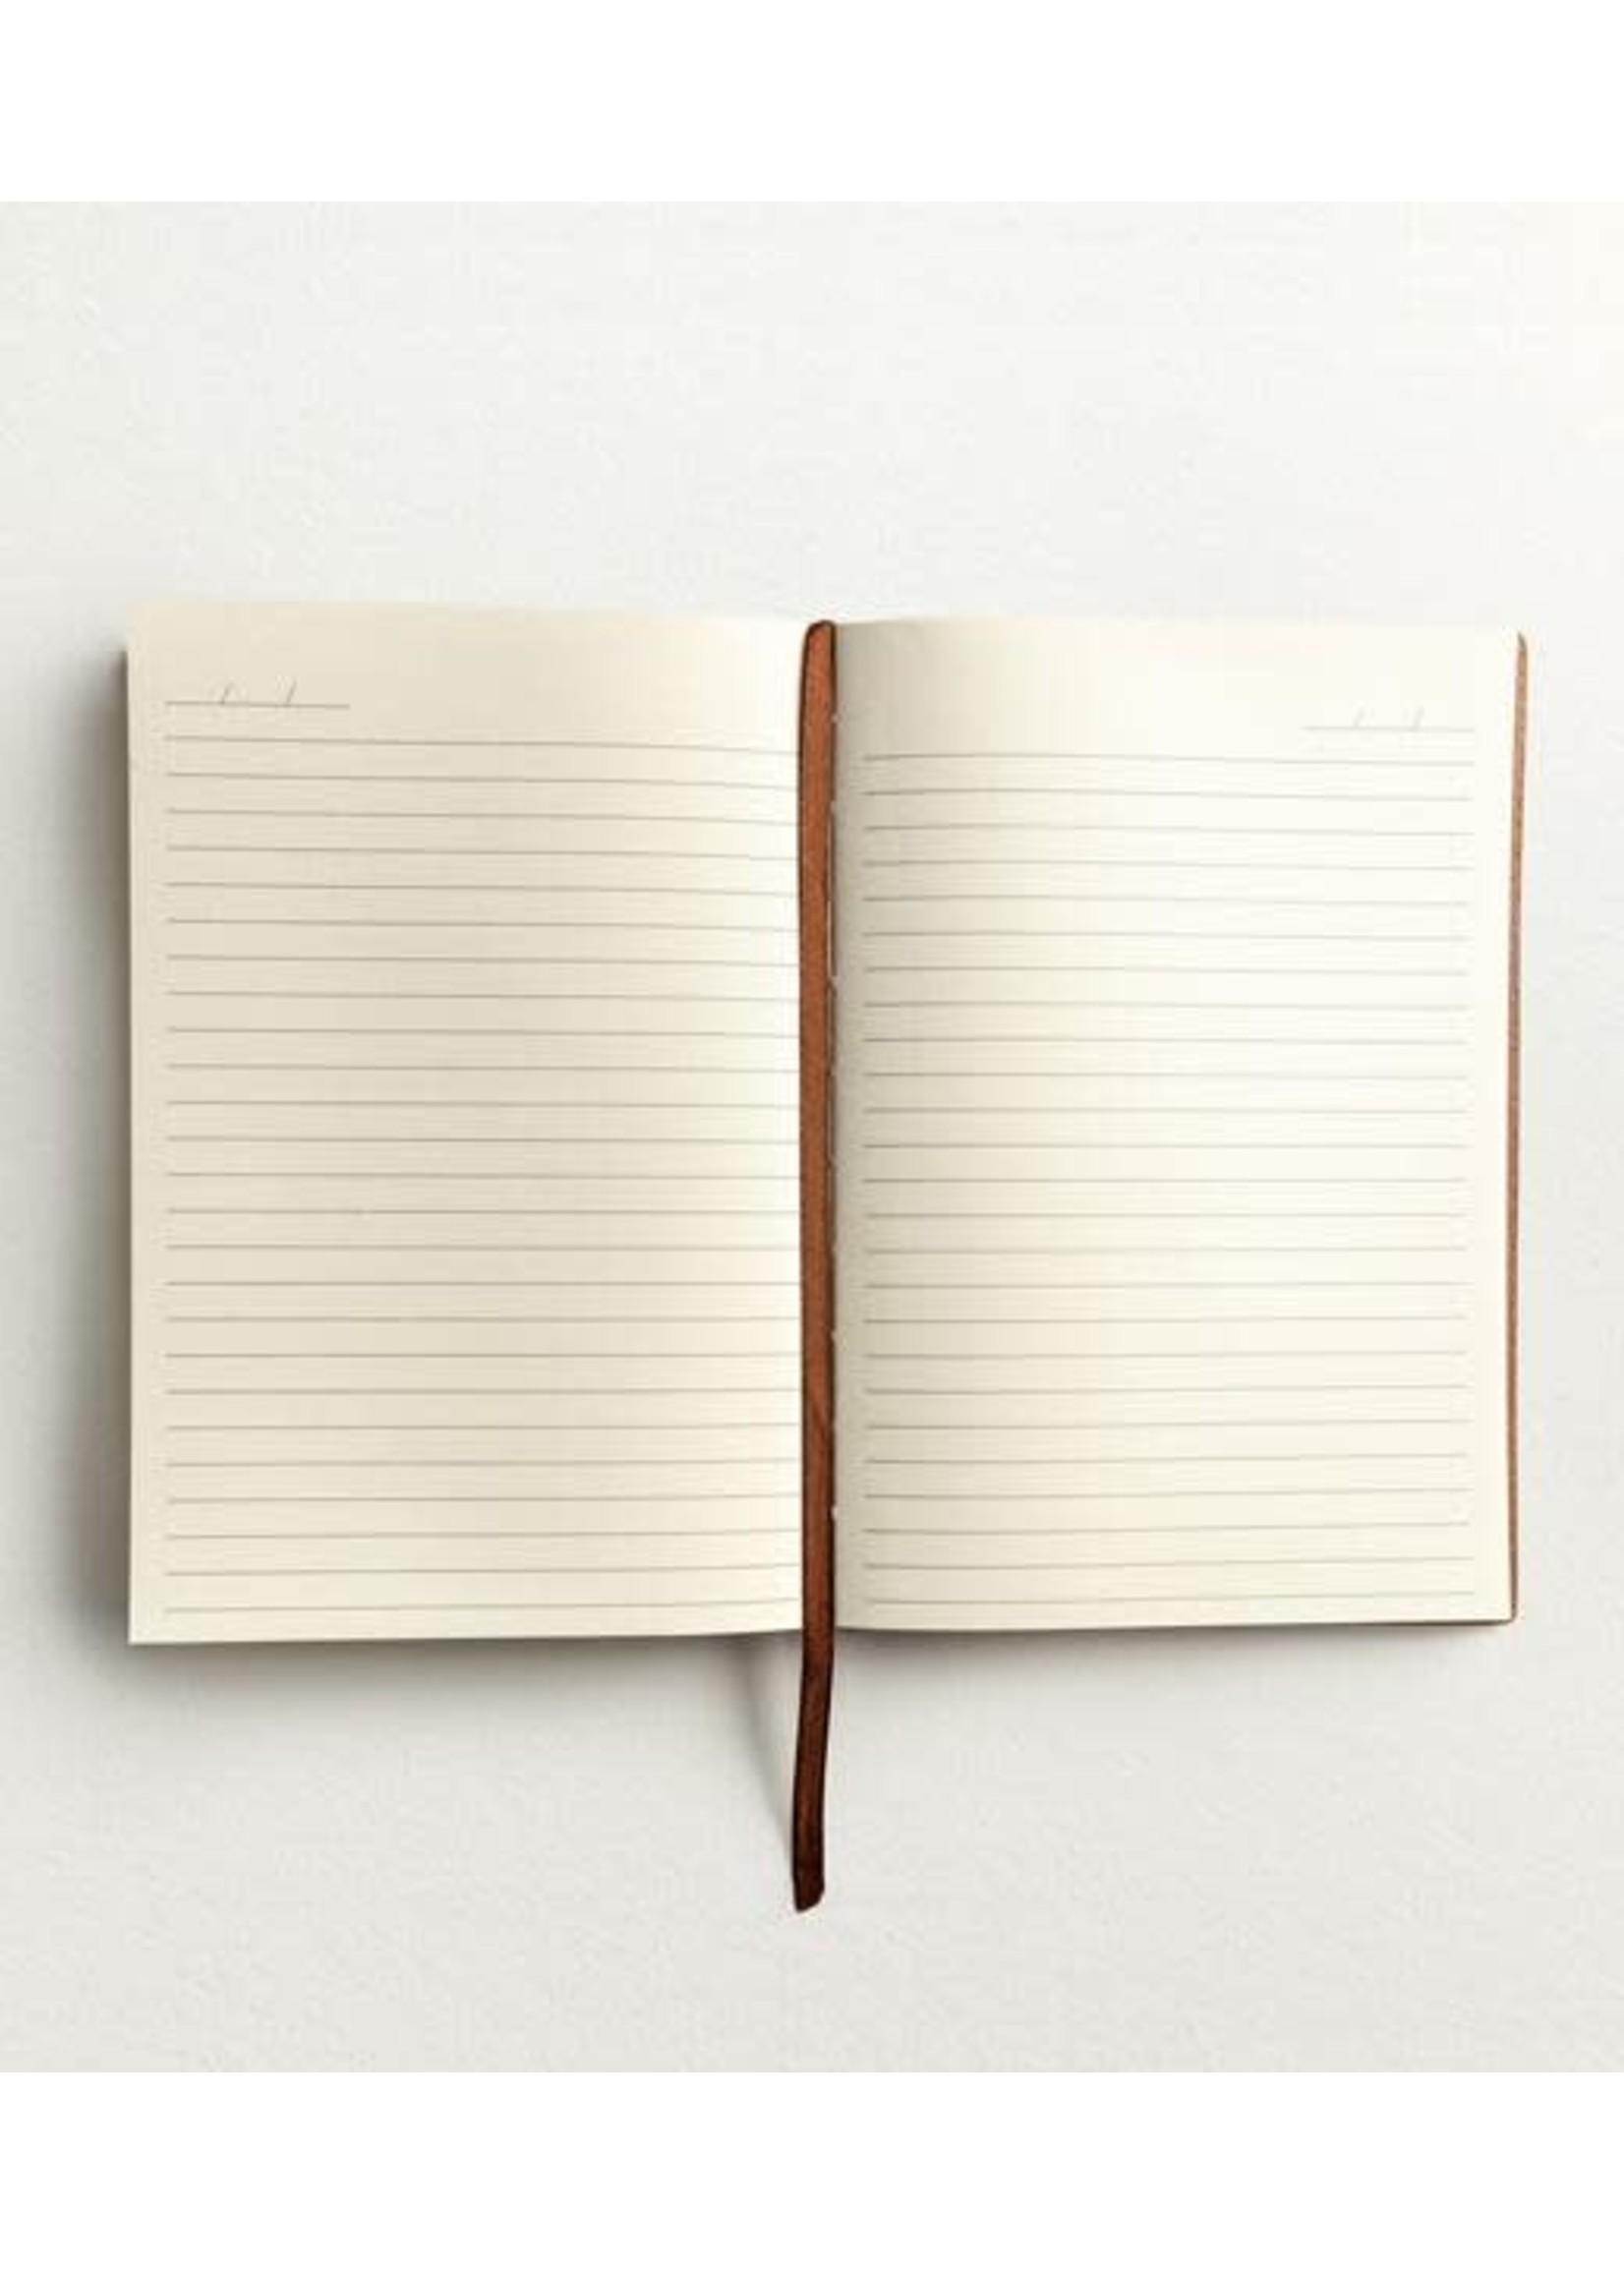 Denik Samantha Lined Journal